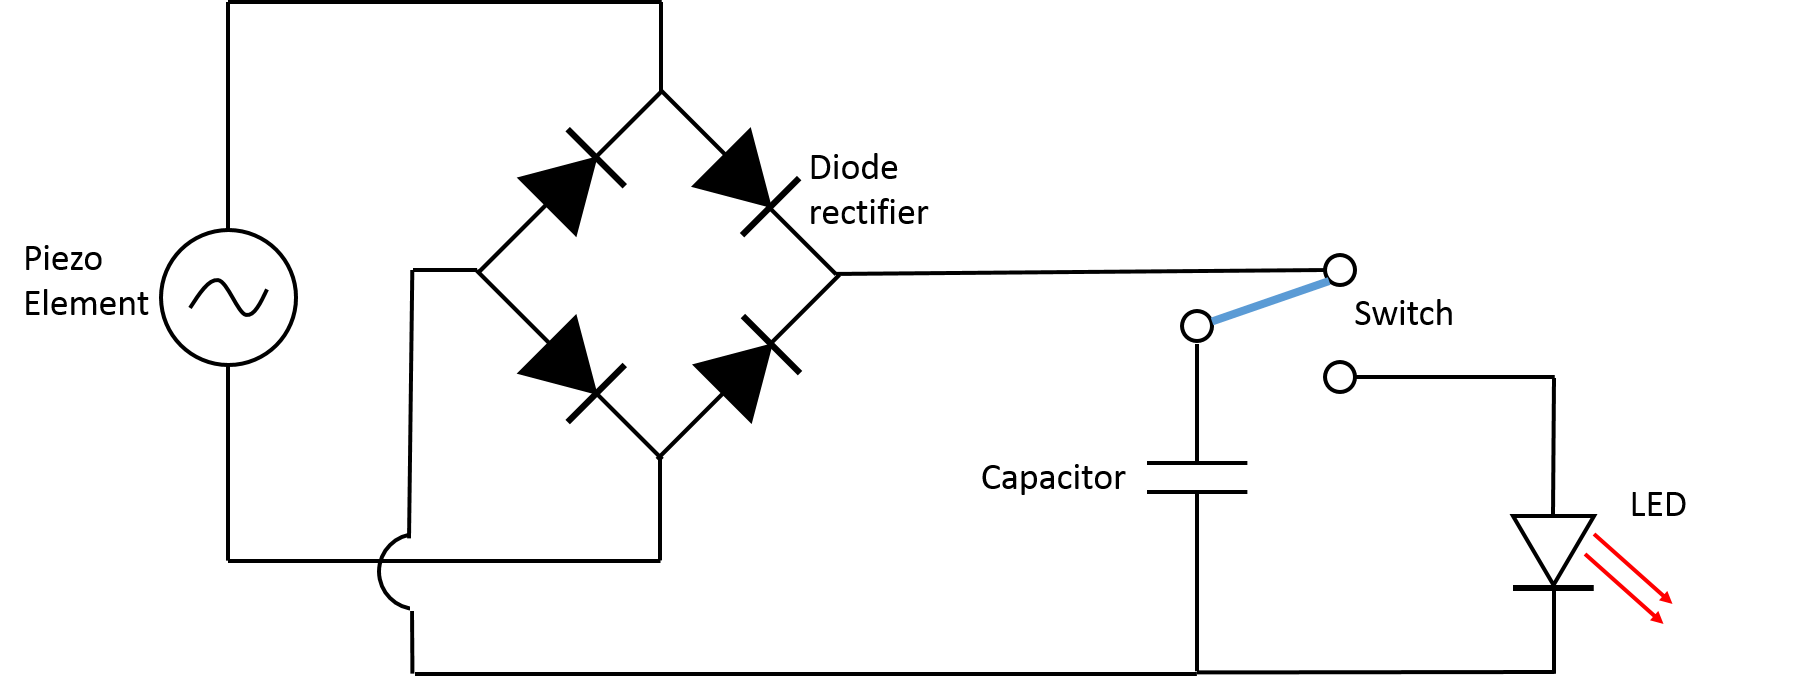 piezopowered lamp circuit diagram